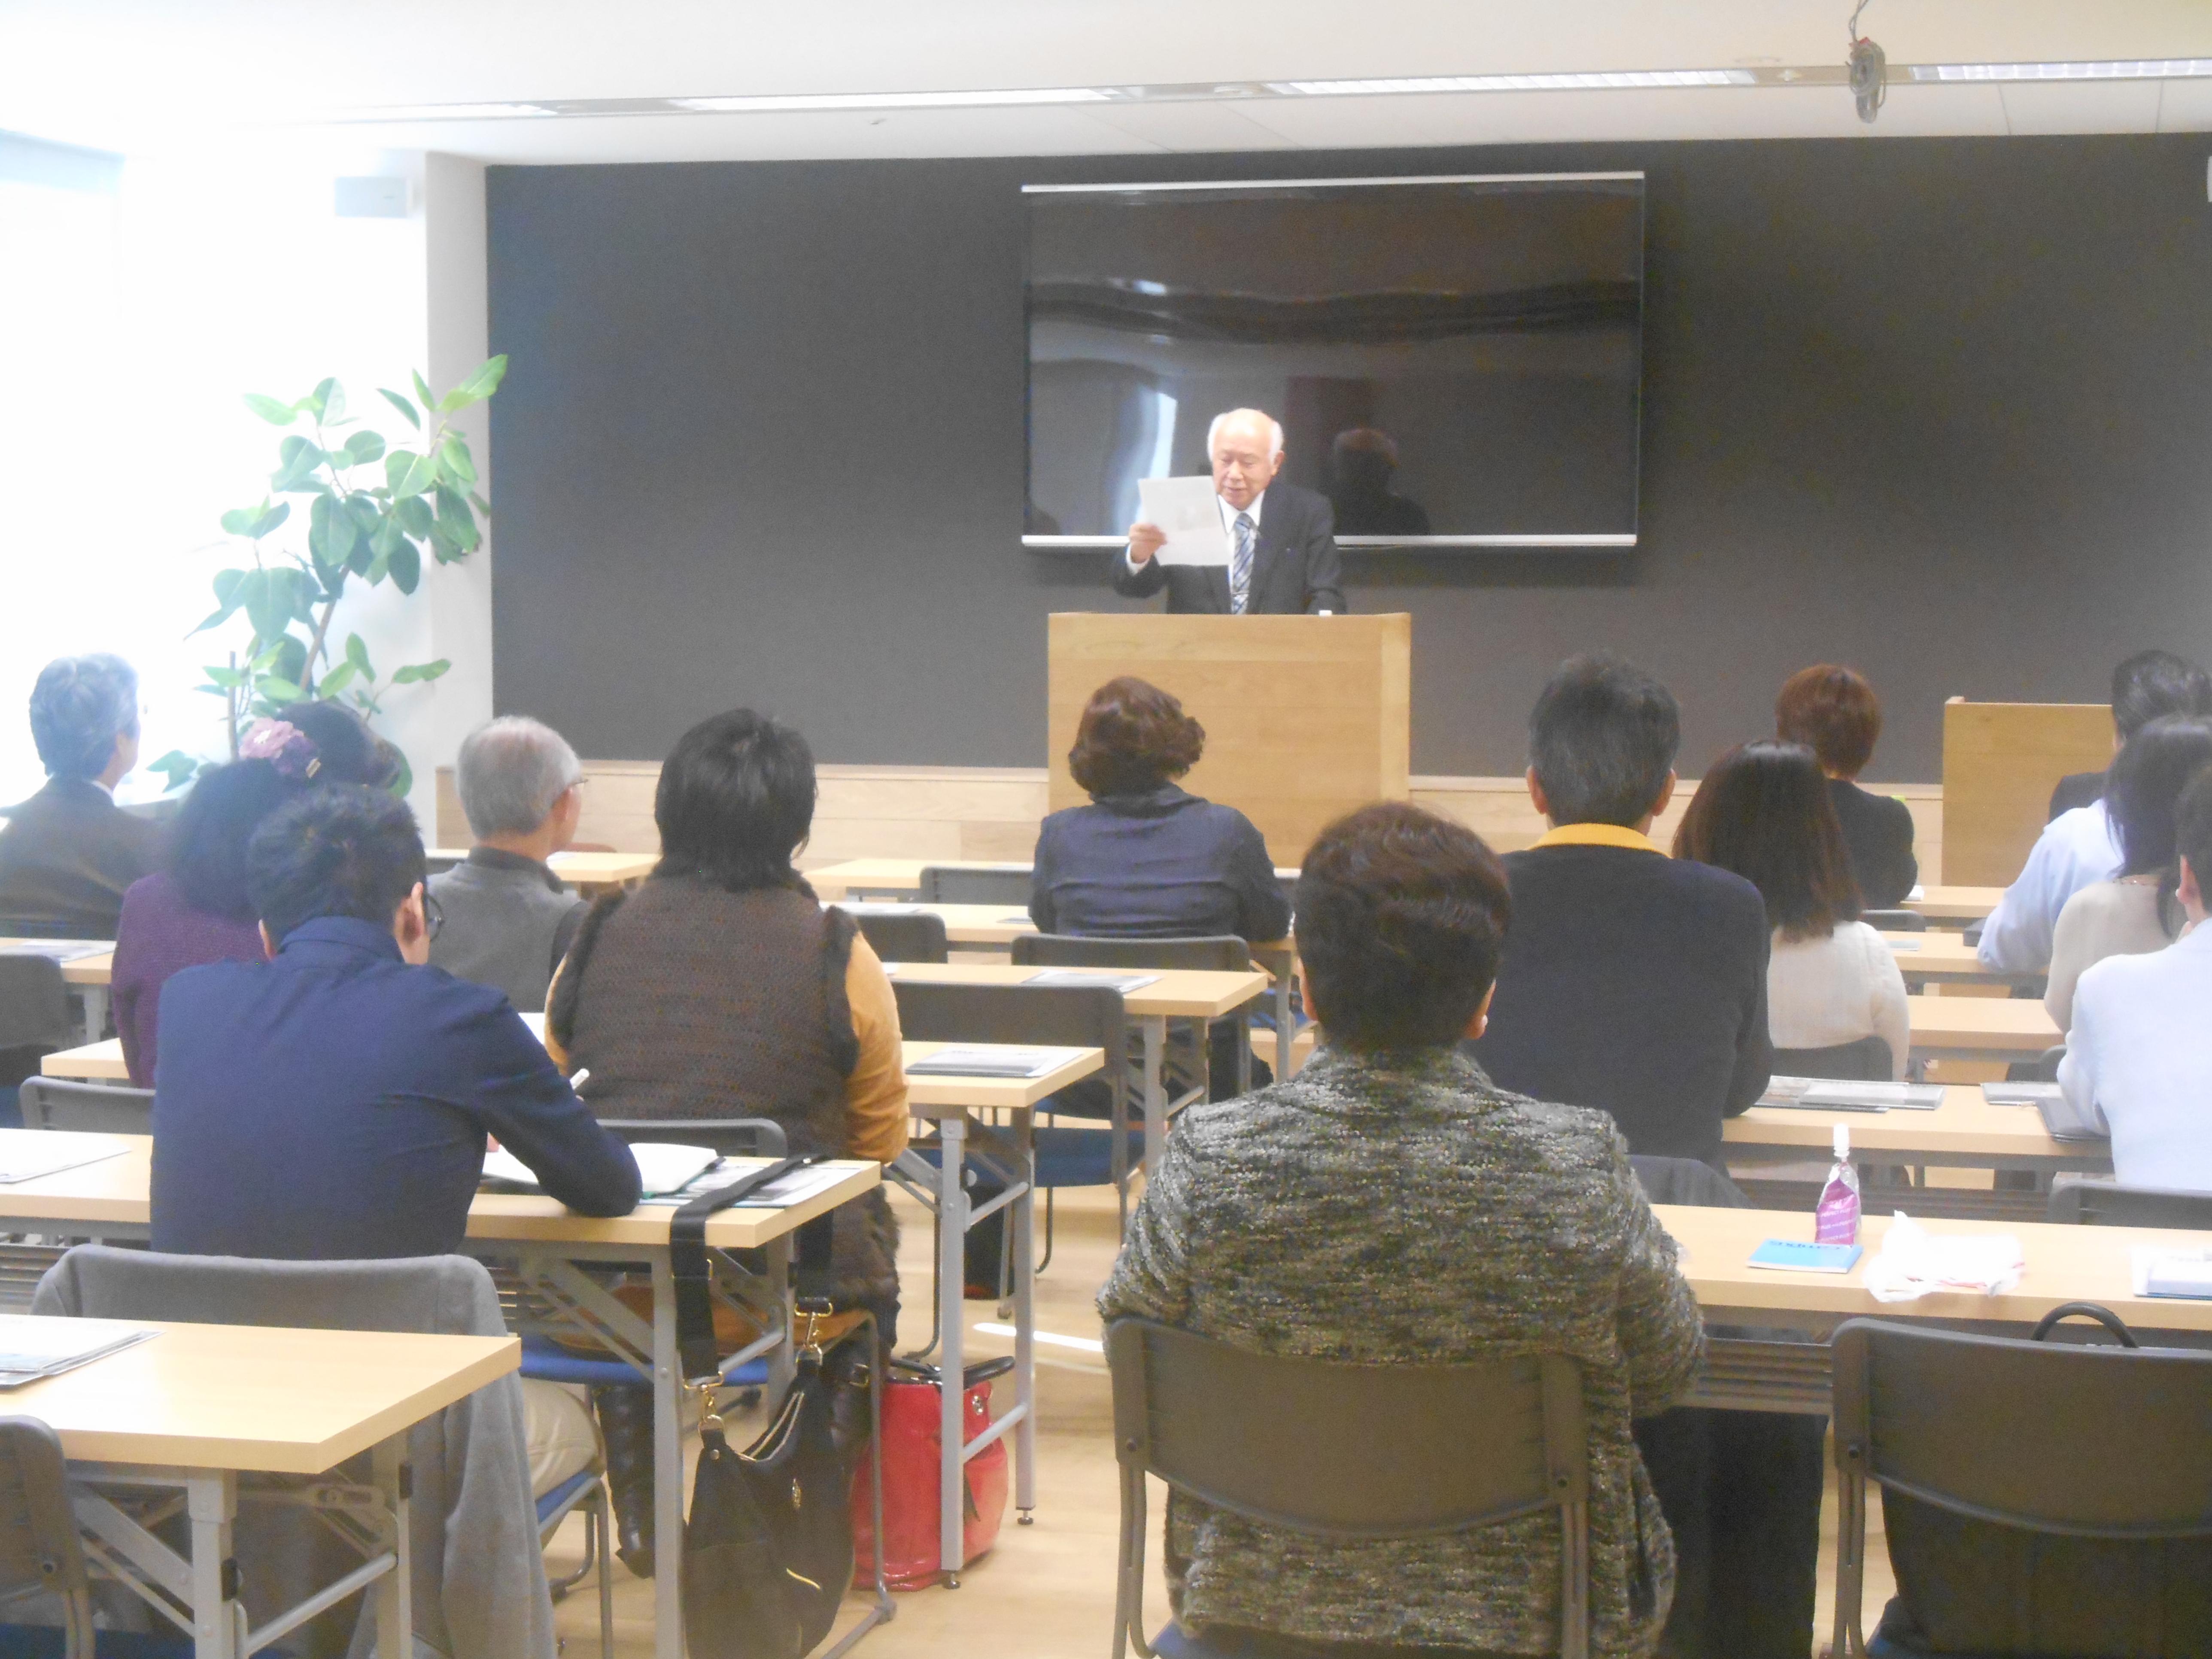 DSCN0429 - 平成30年度 東京思風塾 4月7日(土)「時代が問題をつくり、問題が人物をつくる」